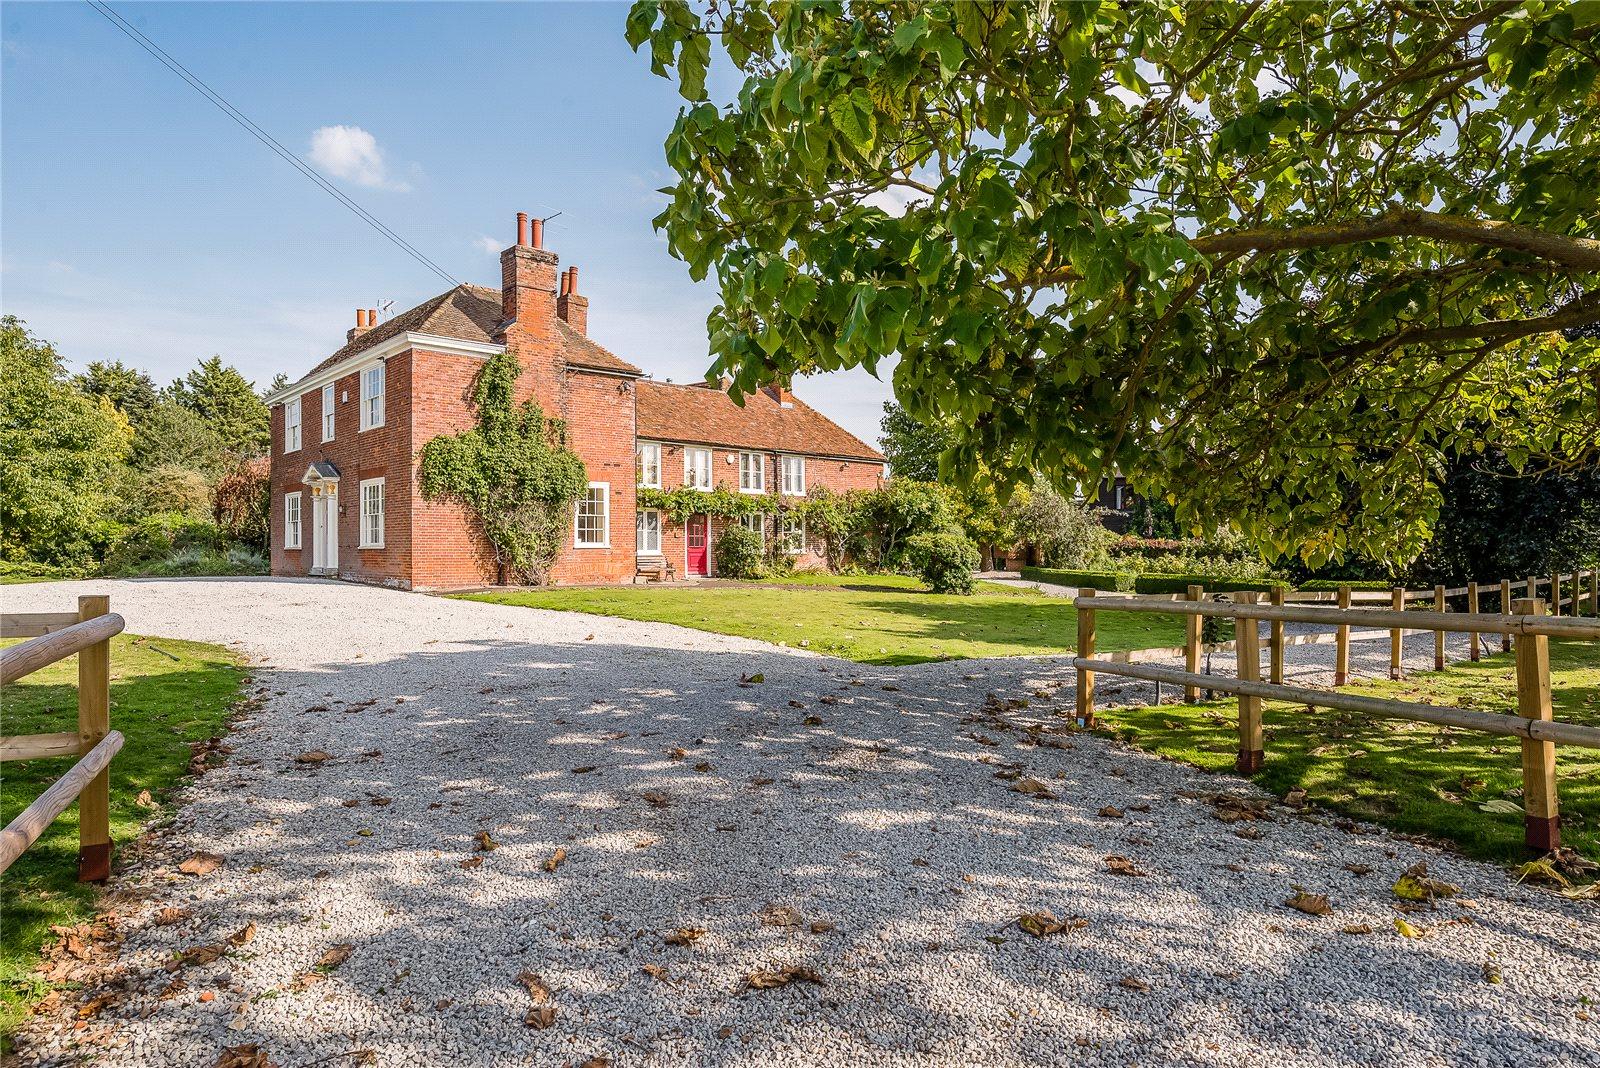 Additional photo for property listing at Homestall Lane, Goodnestone, Faversham, Kent, ME13 Faversham, Inglaterra